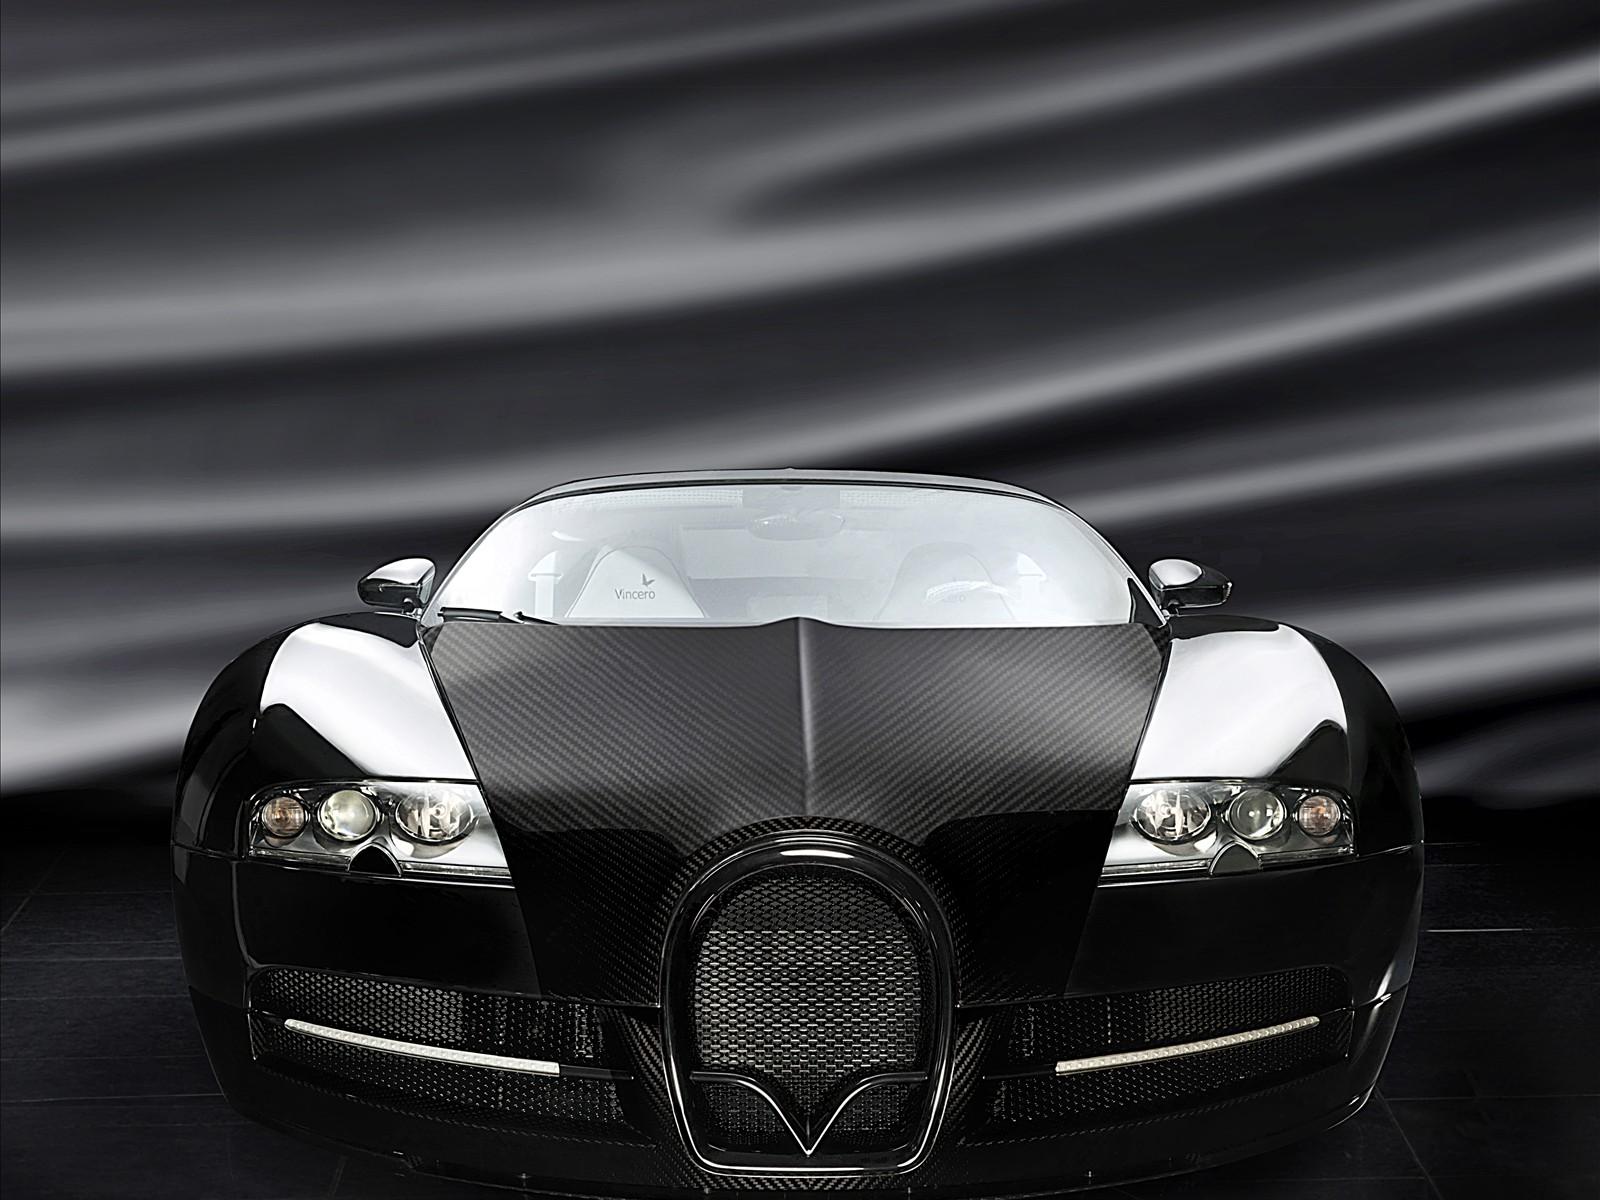 521 Entertainment World: Latest Bugatti Veyron Fantastic Wallpapers 2012